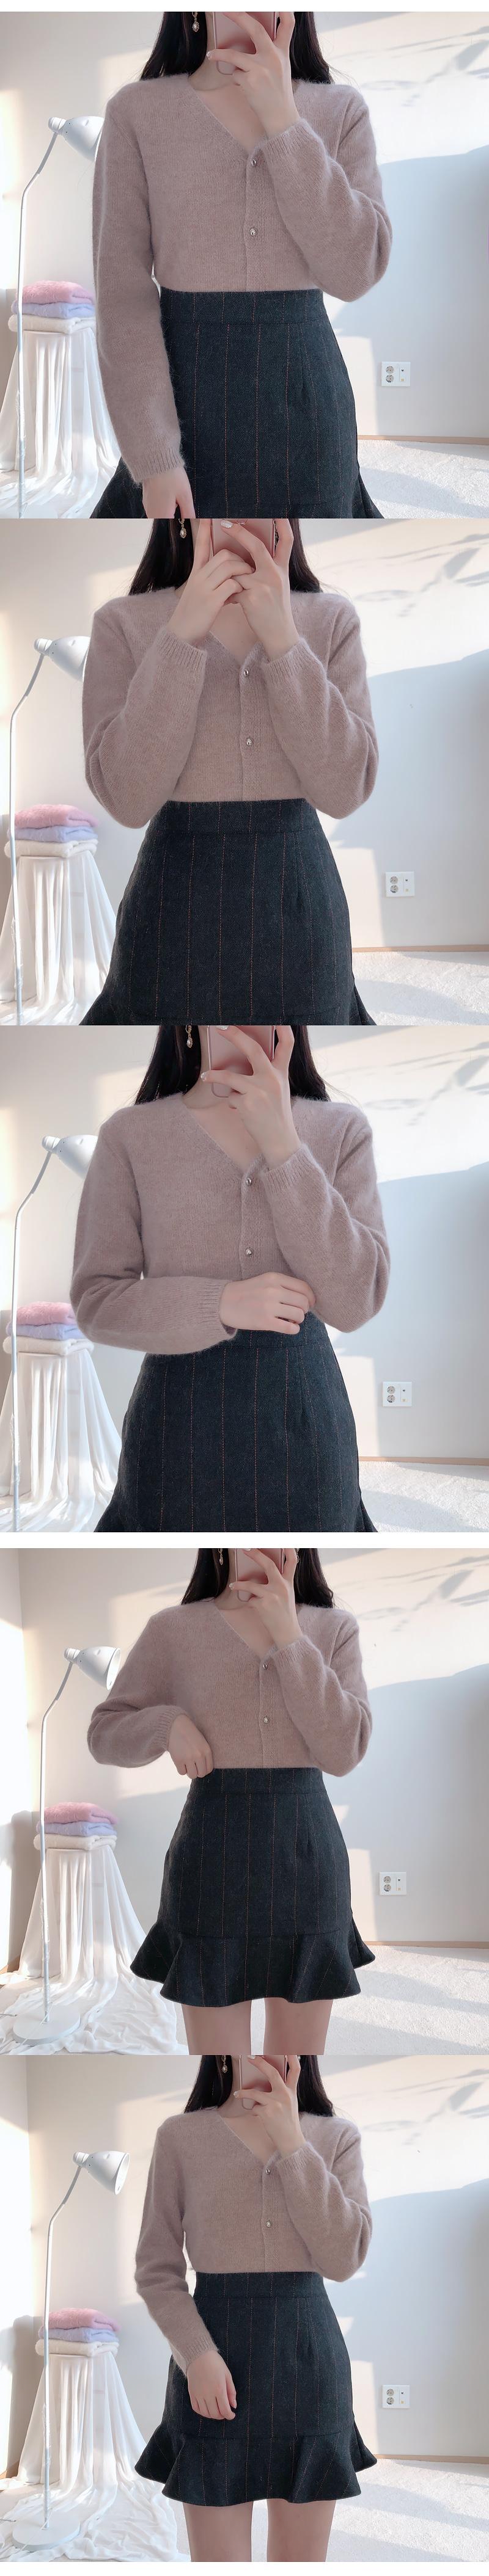 Wool 60% Angora cardigan